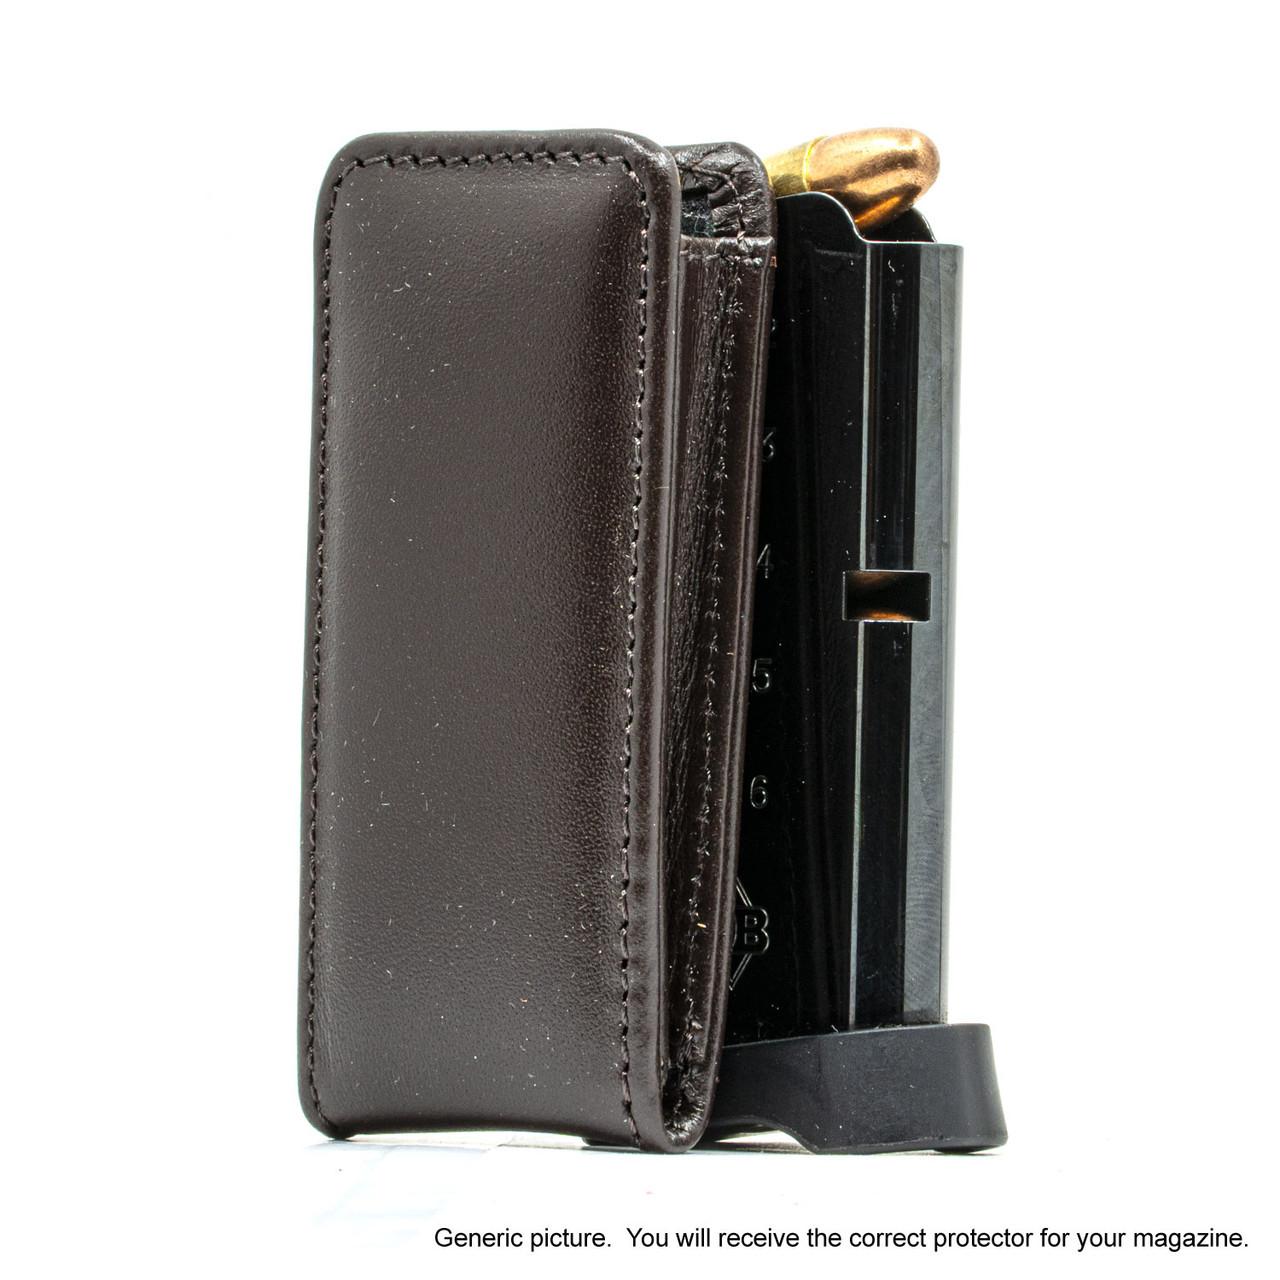 Taurus G2S Brown Leather Magazine Pocket Protector